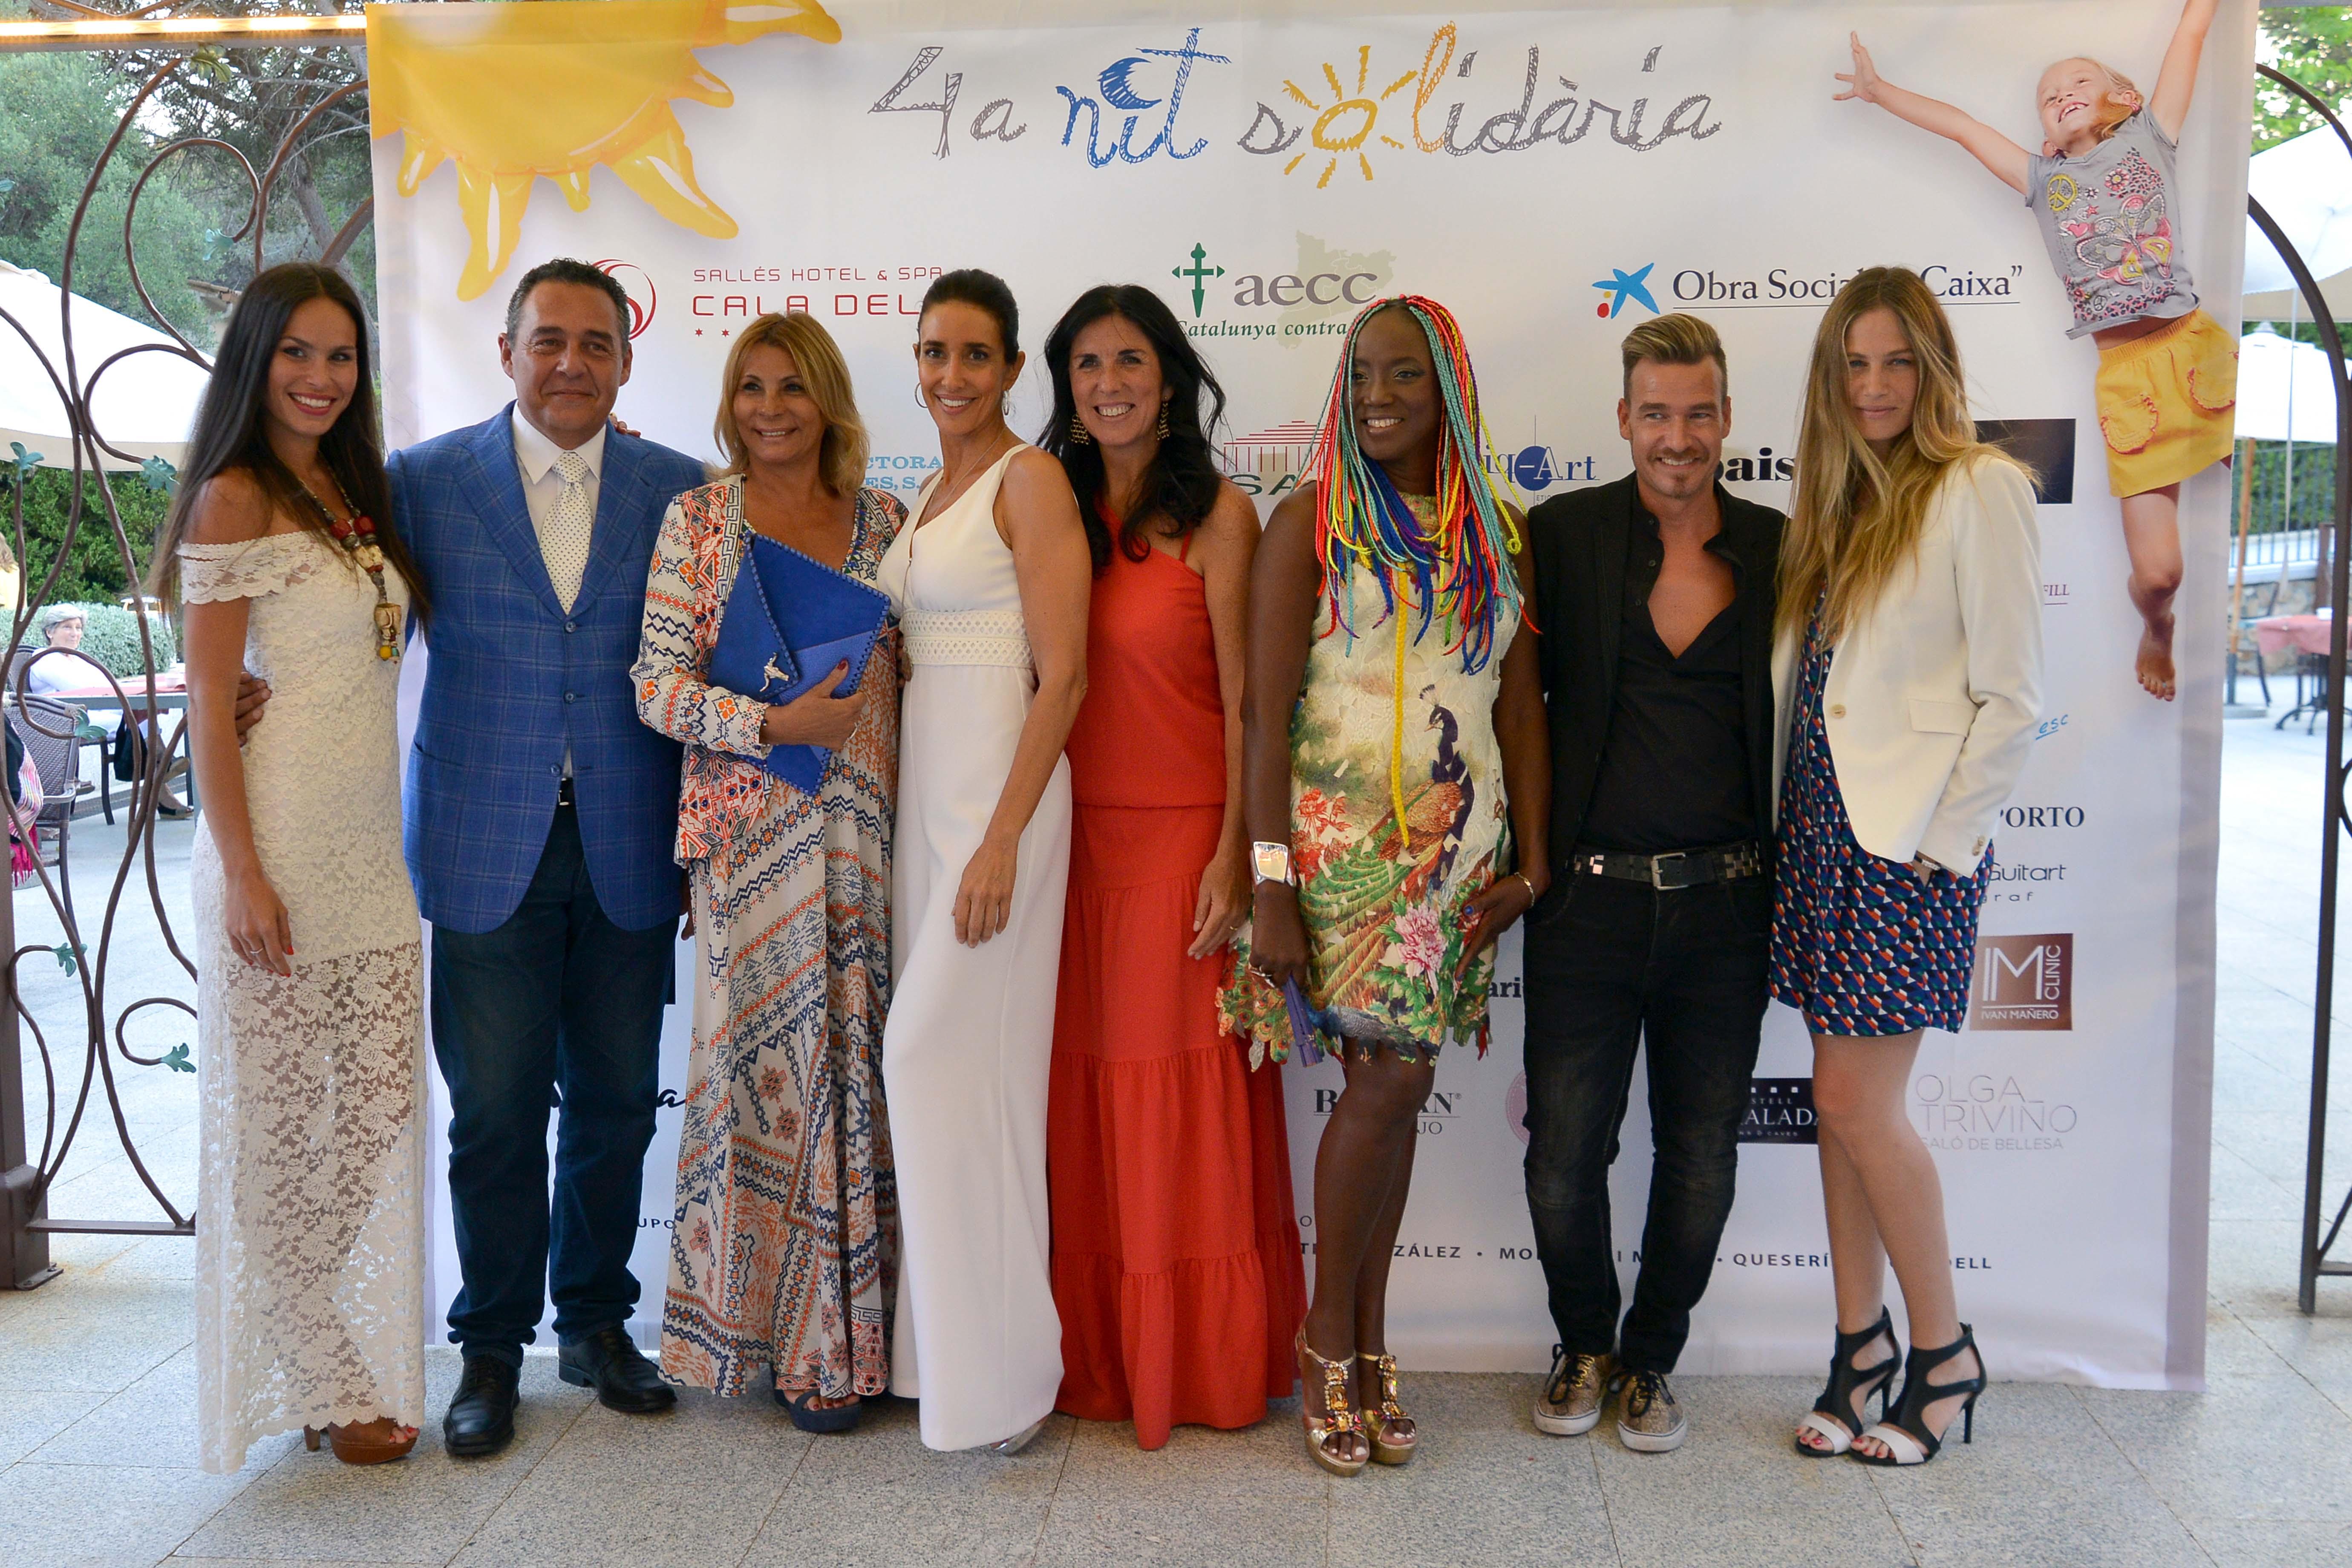 Mireia Canalda, Javier Colocho, Pilar Oporto, Elsa Anka, Cristina Cubero, Lucrecia, Jordi Dalmau y Martina Klein